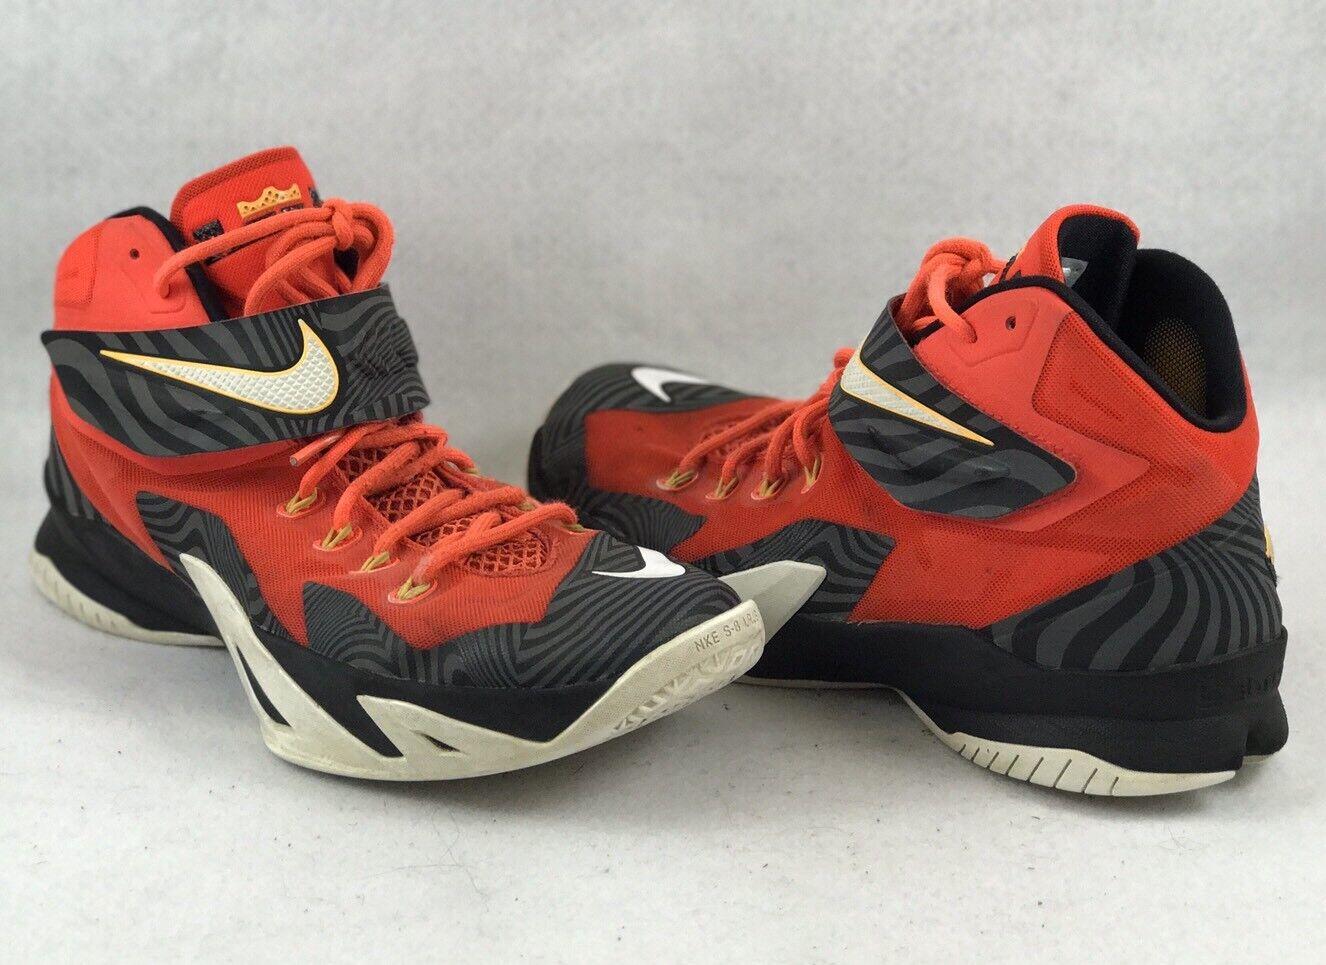 Nike Zoom Lebron Soldier VIII 688579 Black/Red Size 10.5 - 1199